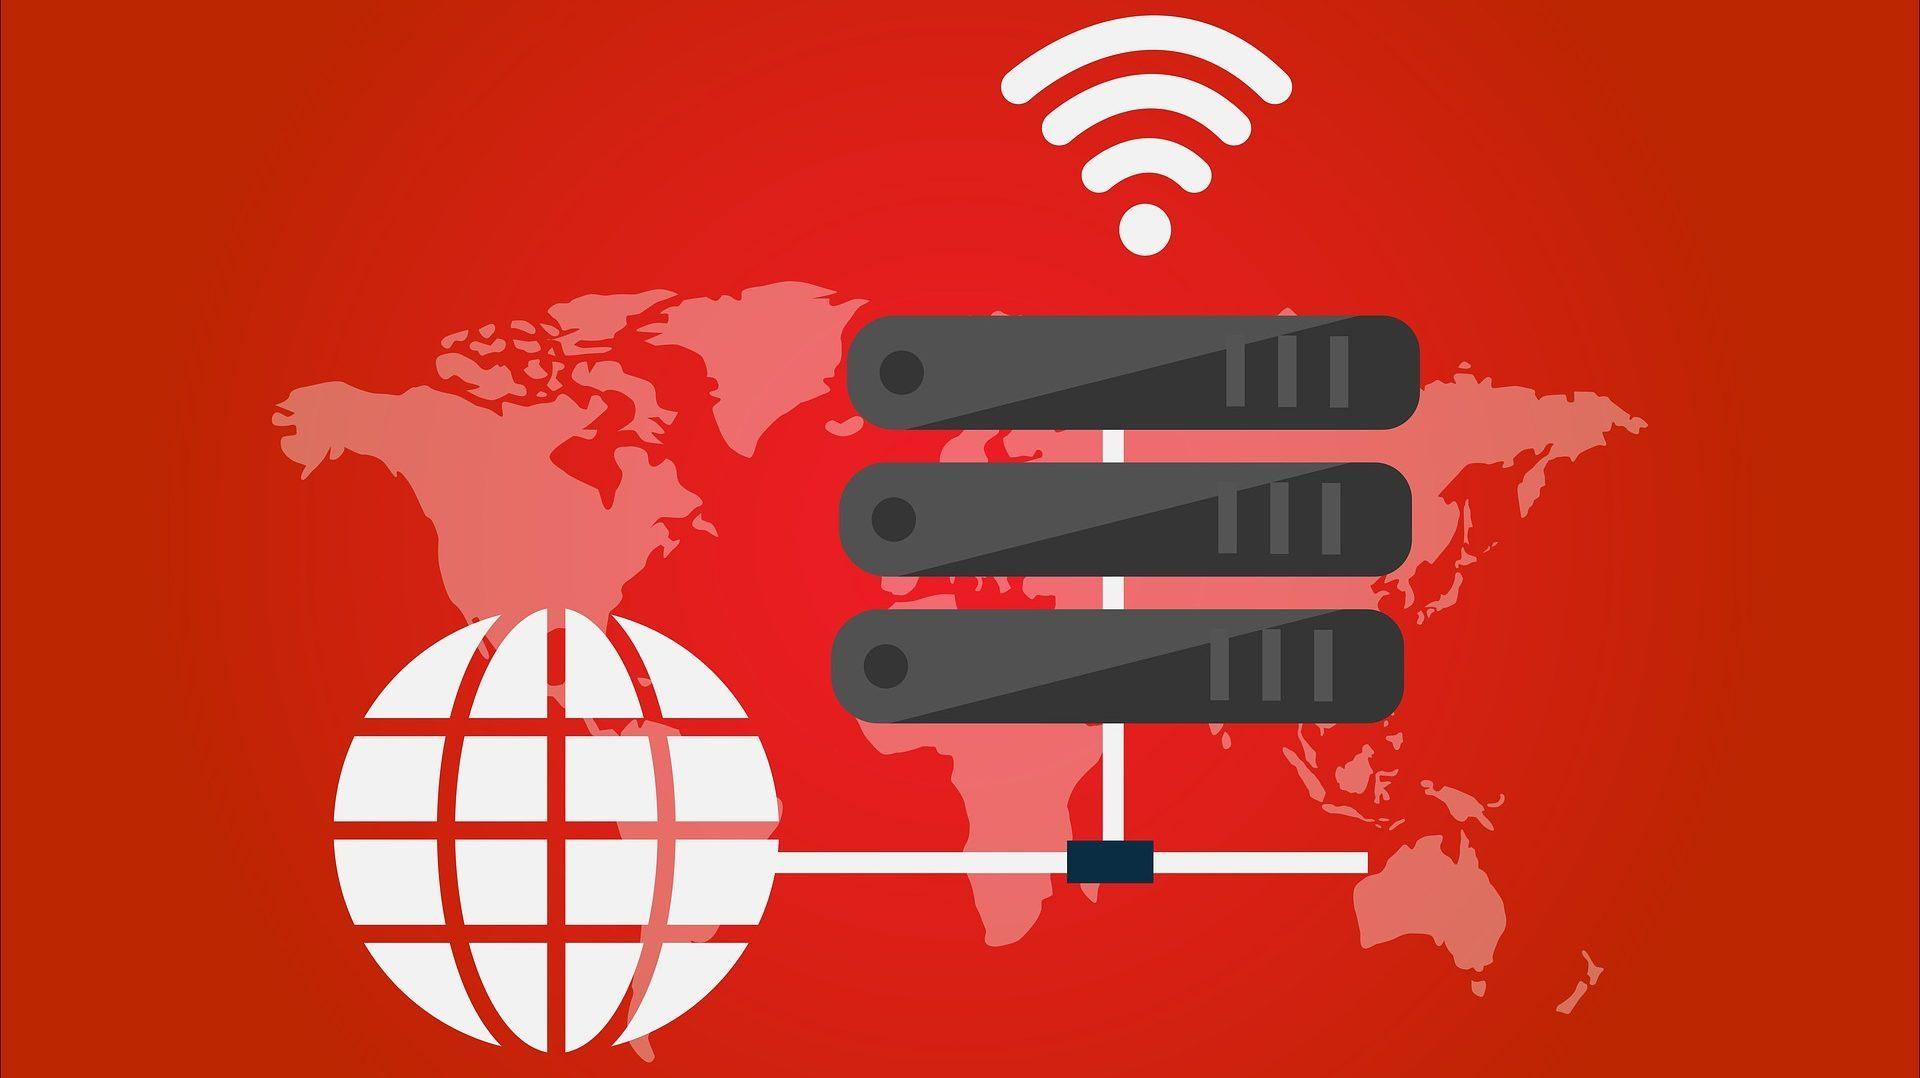 The Top 7 VPN in 2019 - for Netflix, Firestick, Torrenting…